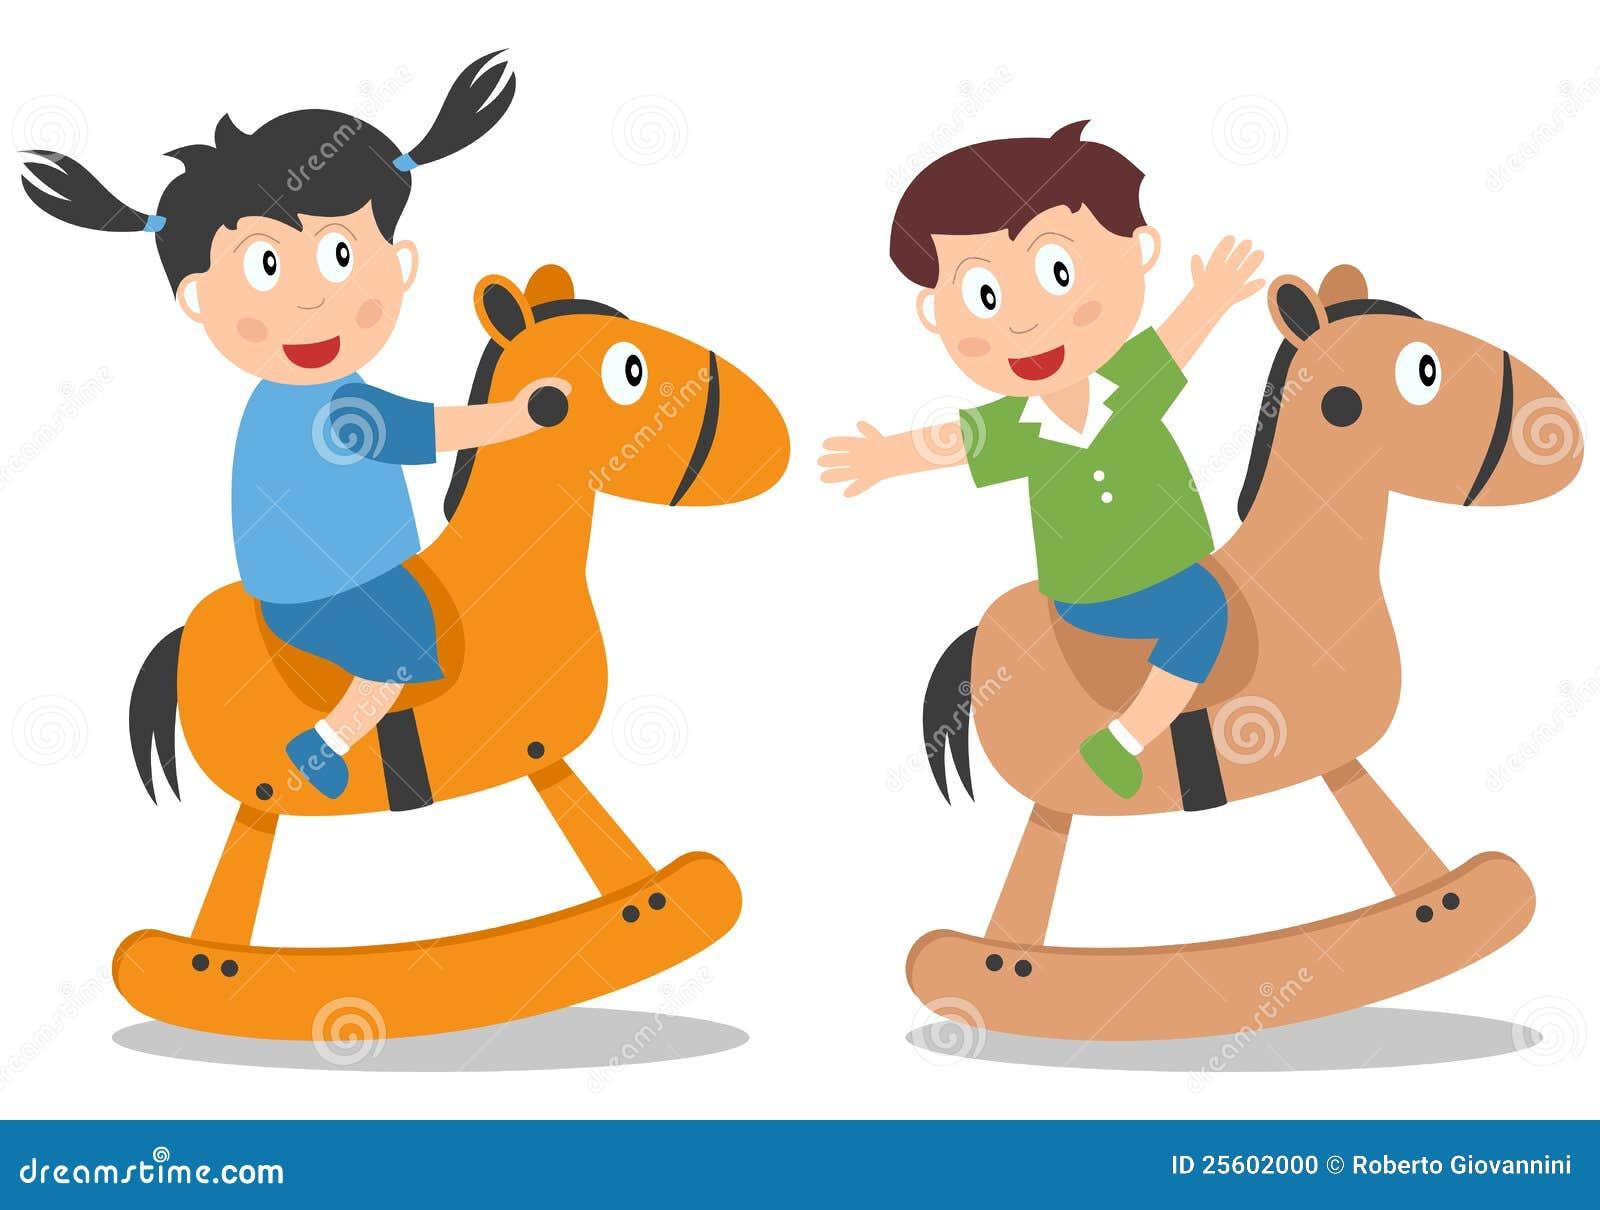 Kids Playing With Rocking Horse Illustration 25602000 Megapixl